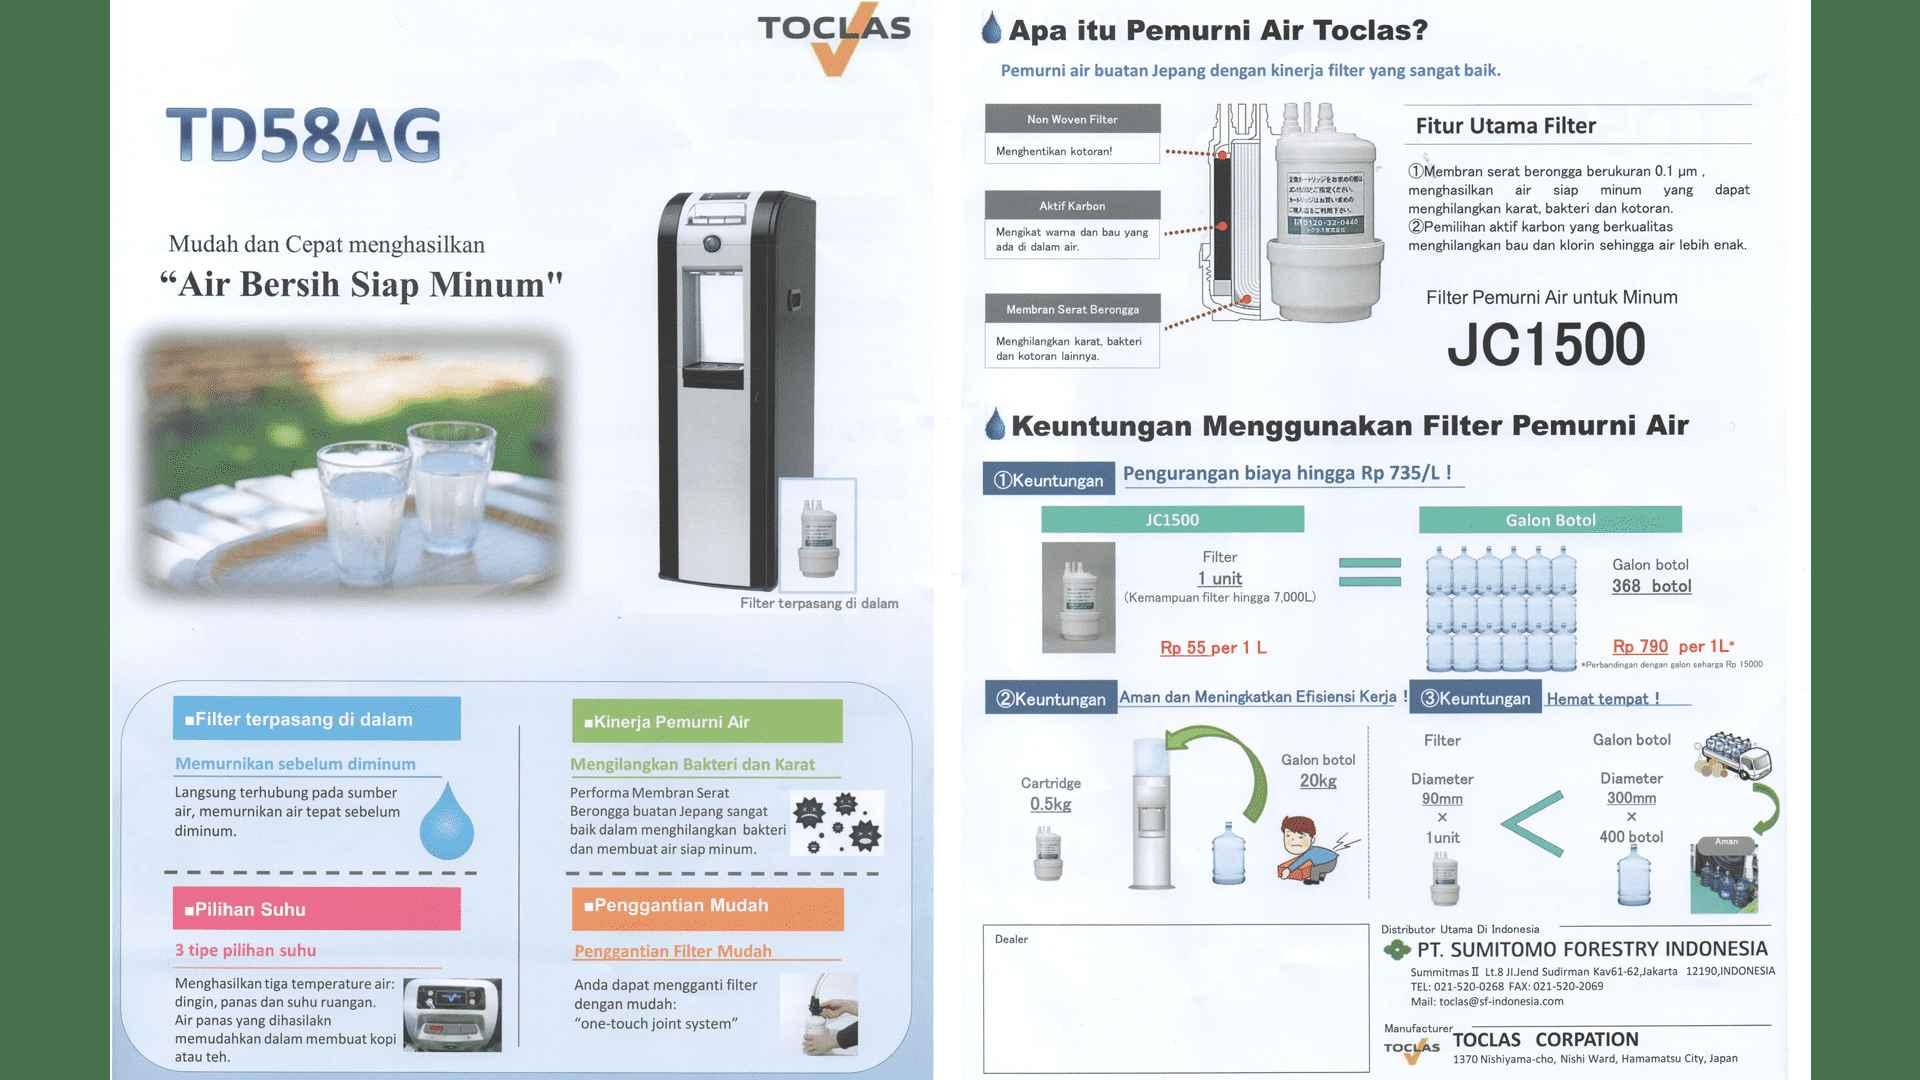 Filter Air Teknologi Canggih Toclas